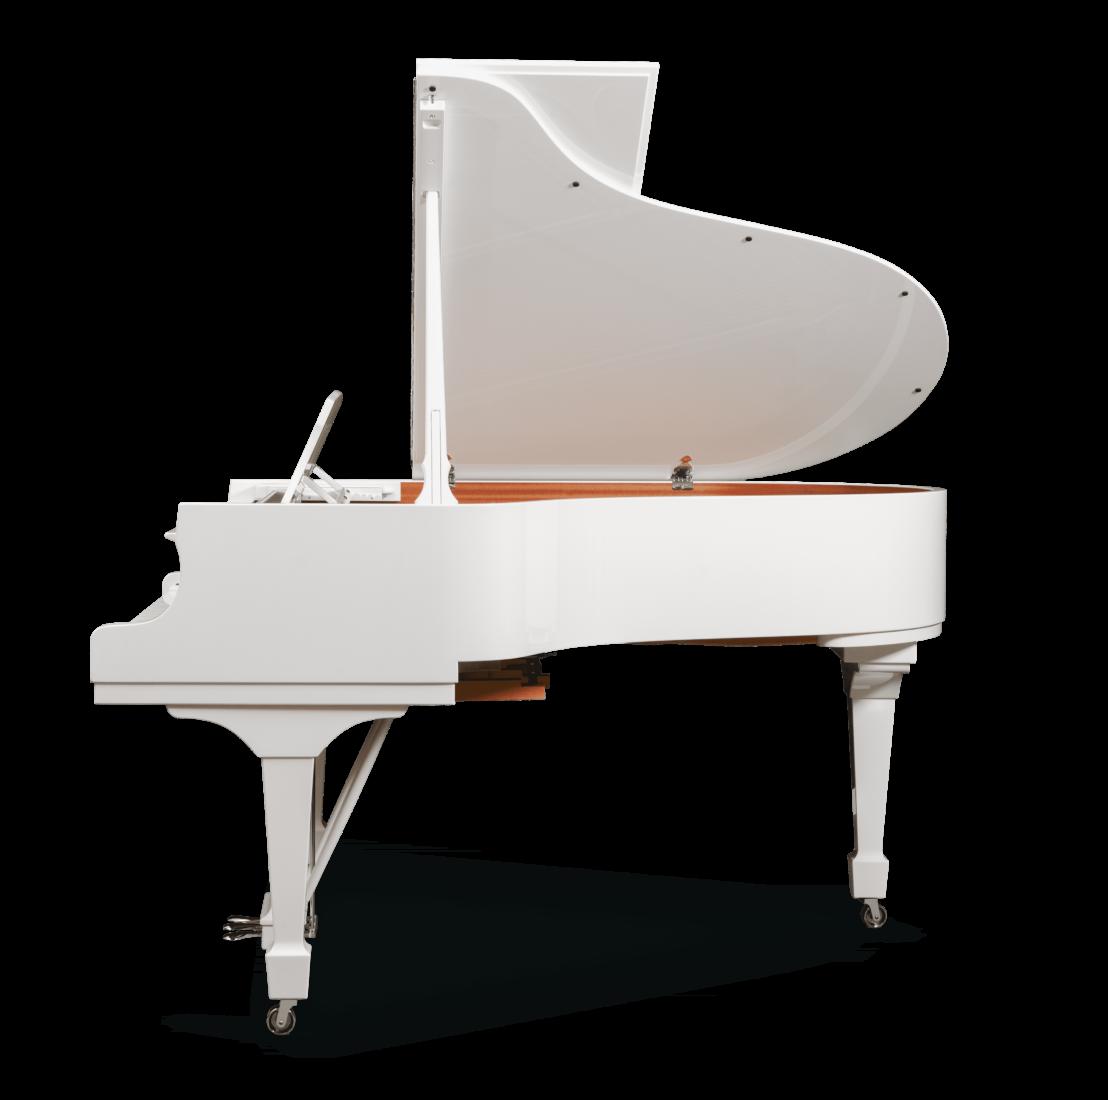 piano de cola Steinway & Sons Spirio O180 Chrome plano general lateral 3